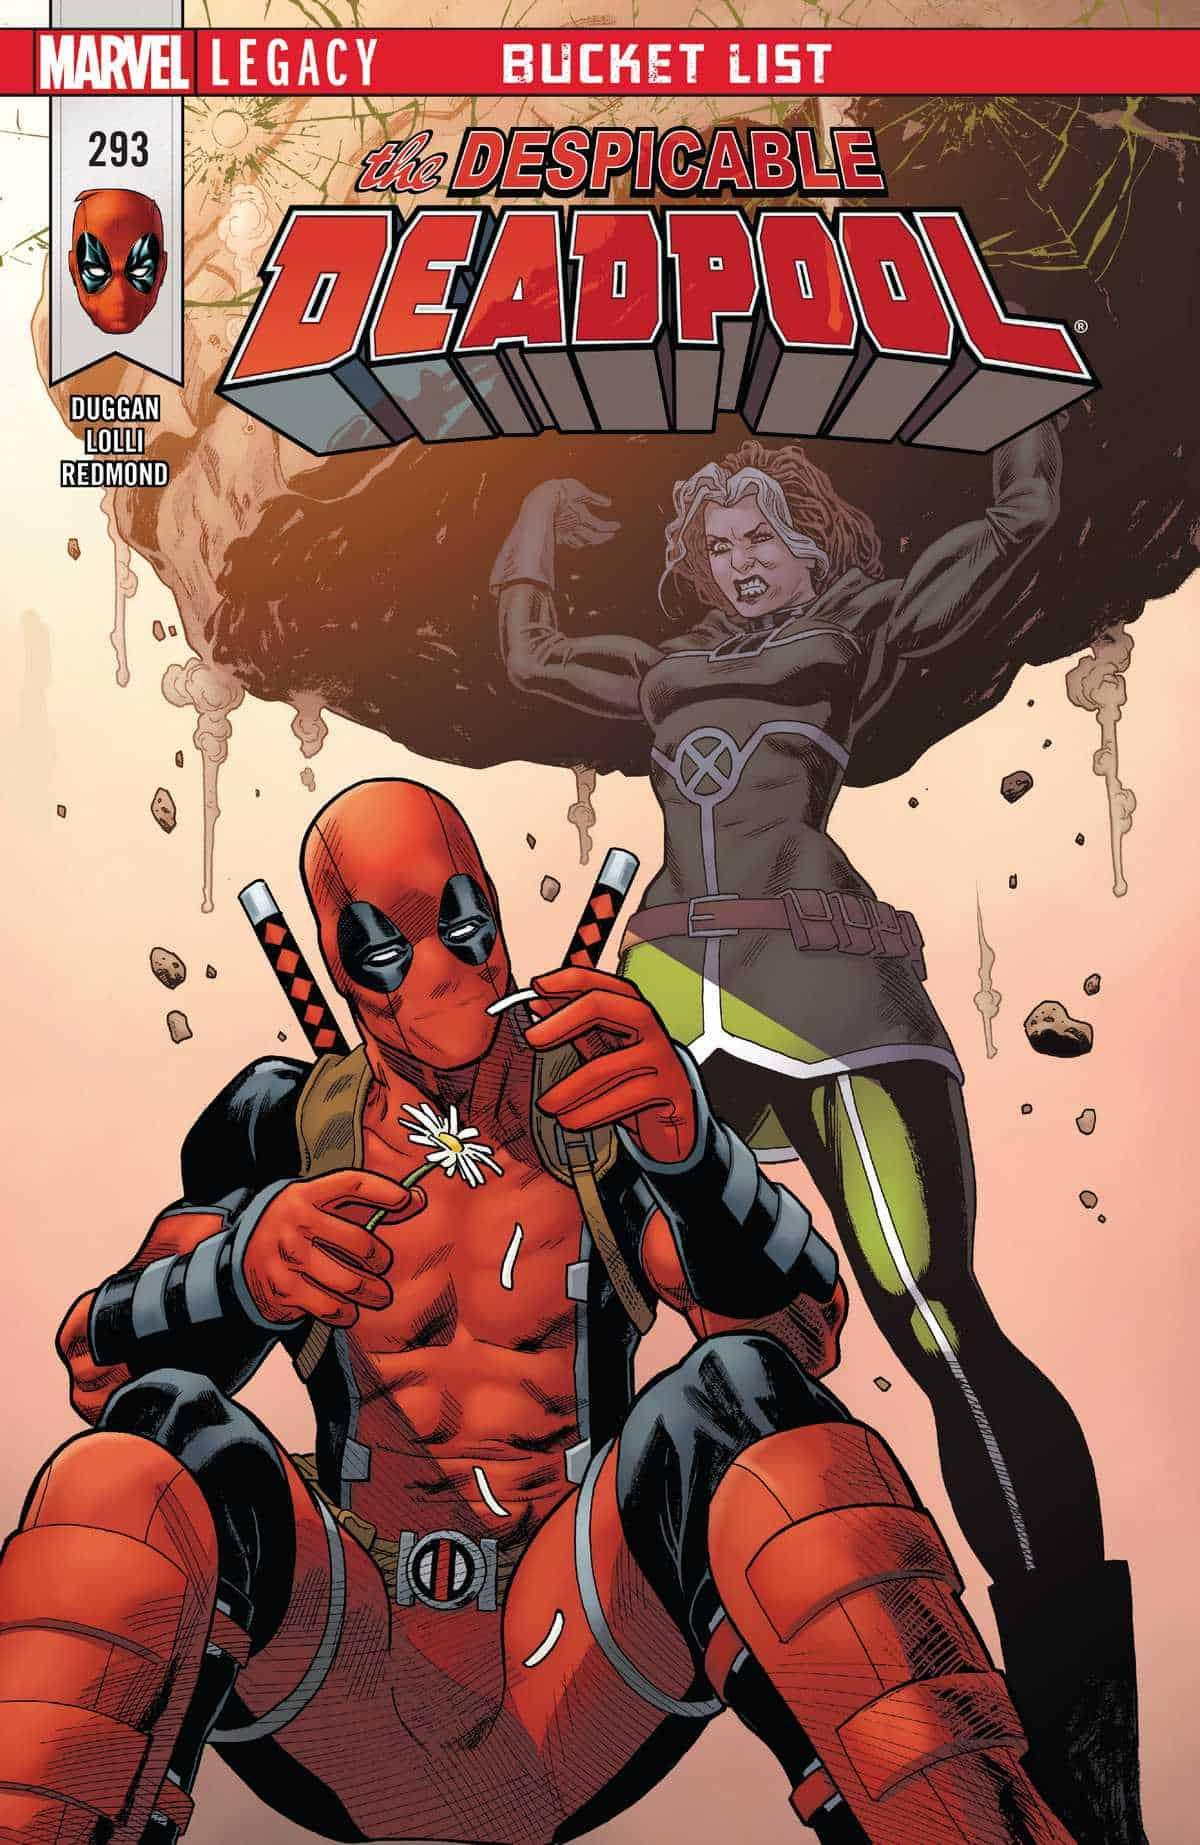 Deadpool293-1.jpg